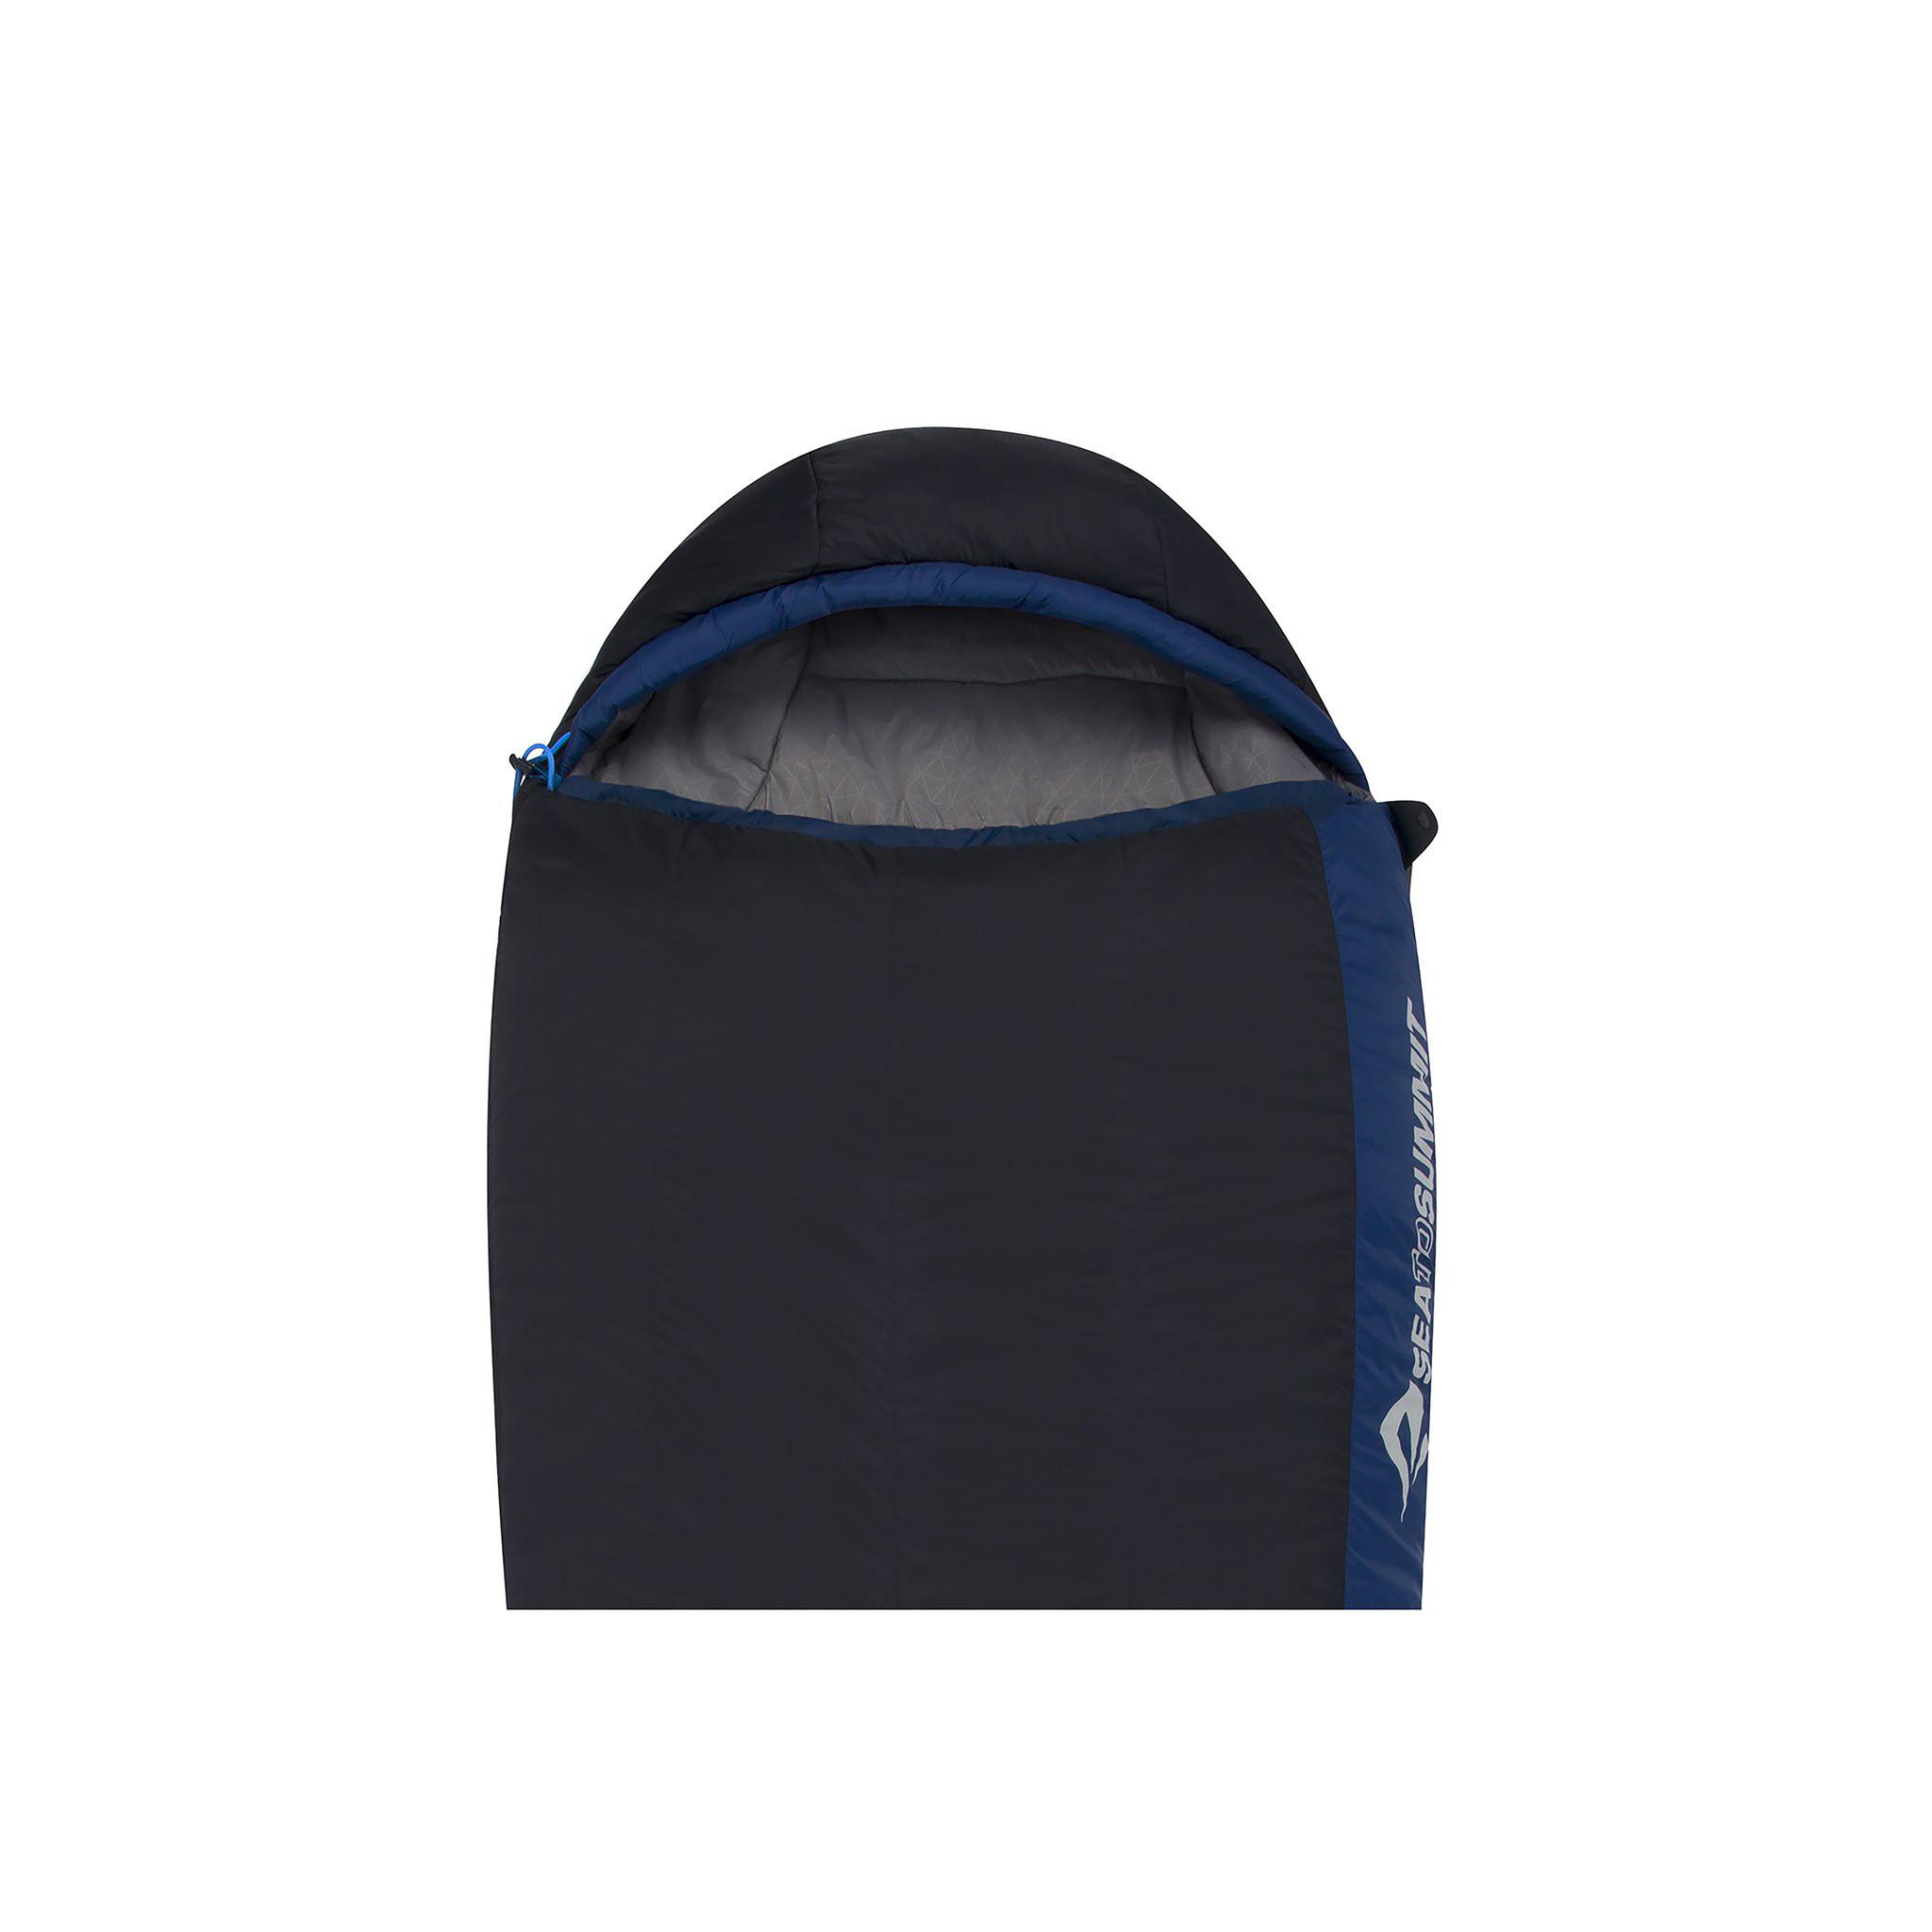 Trailhead Synthetic Sleeping Bag, 30F, Long-5